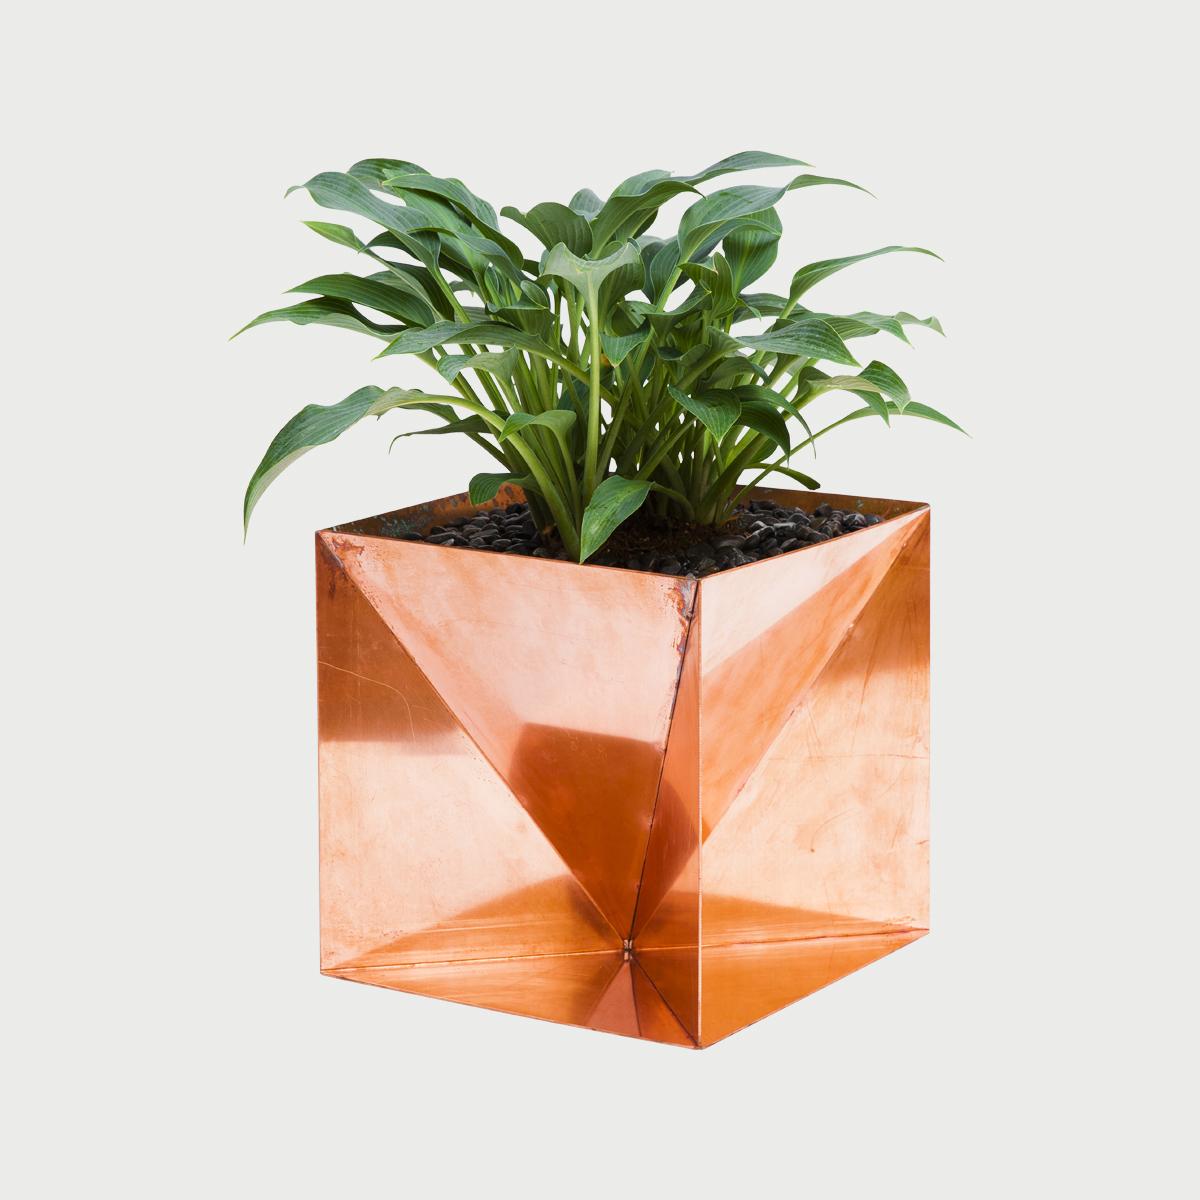 Origamiplantercopper